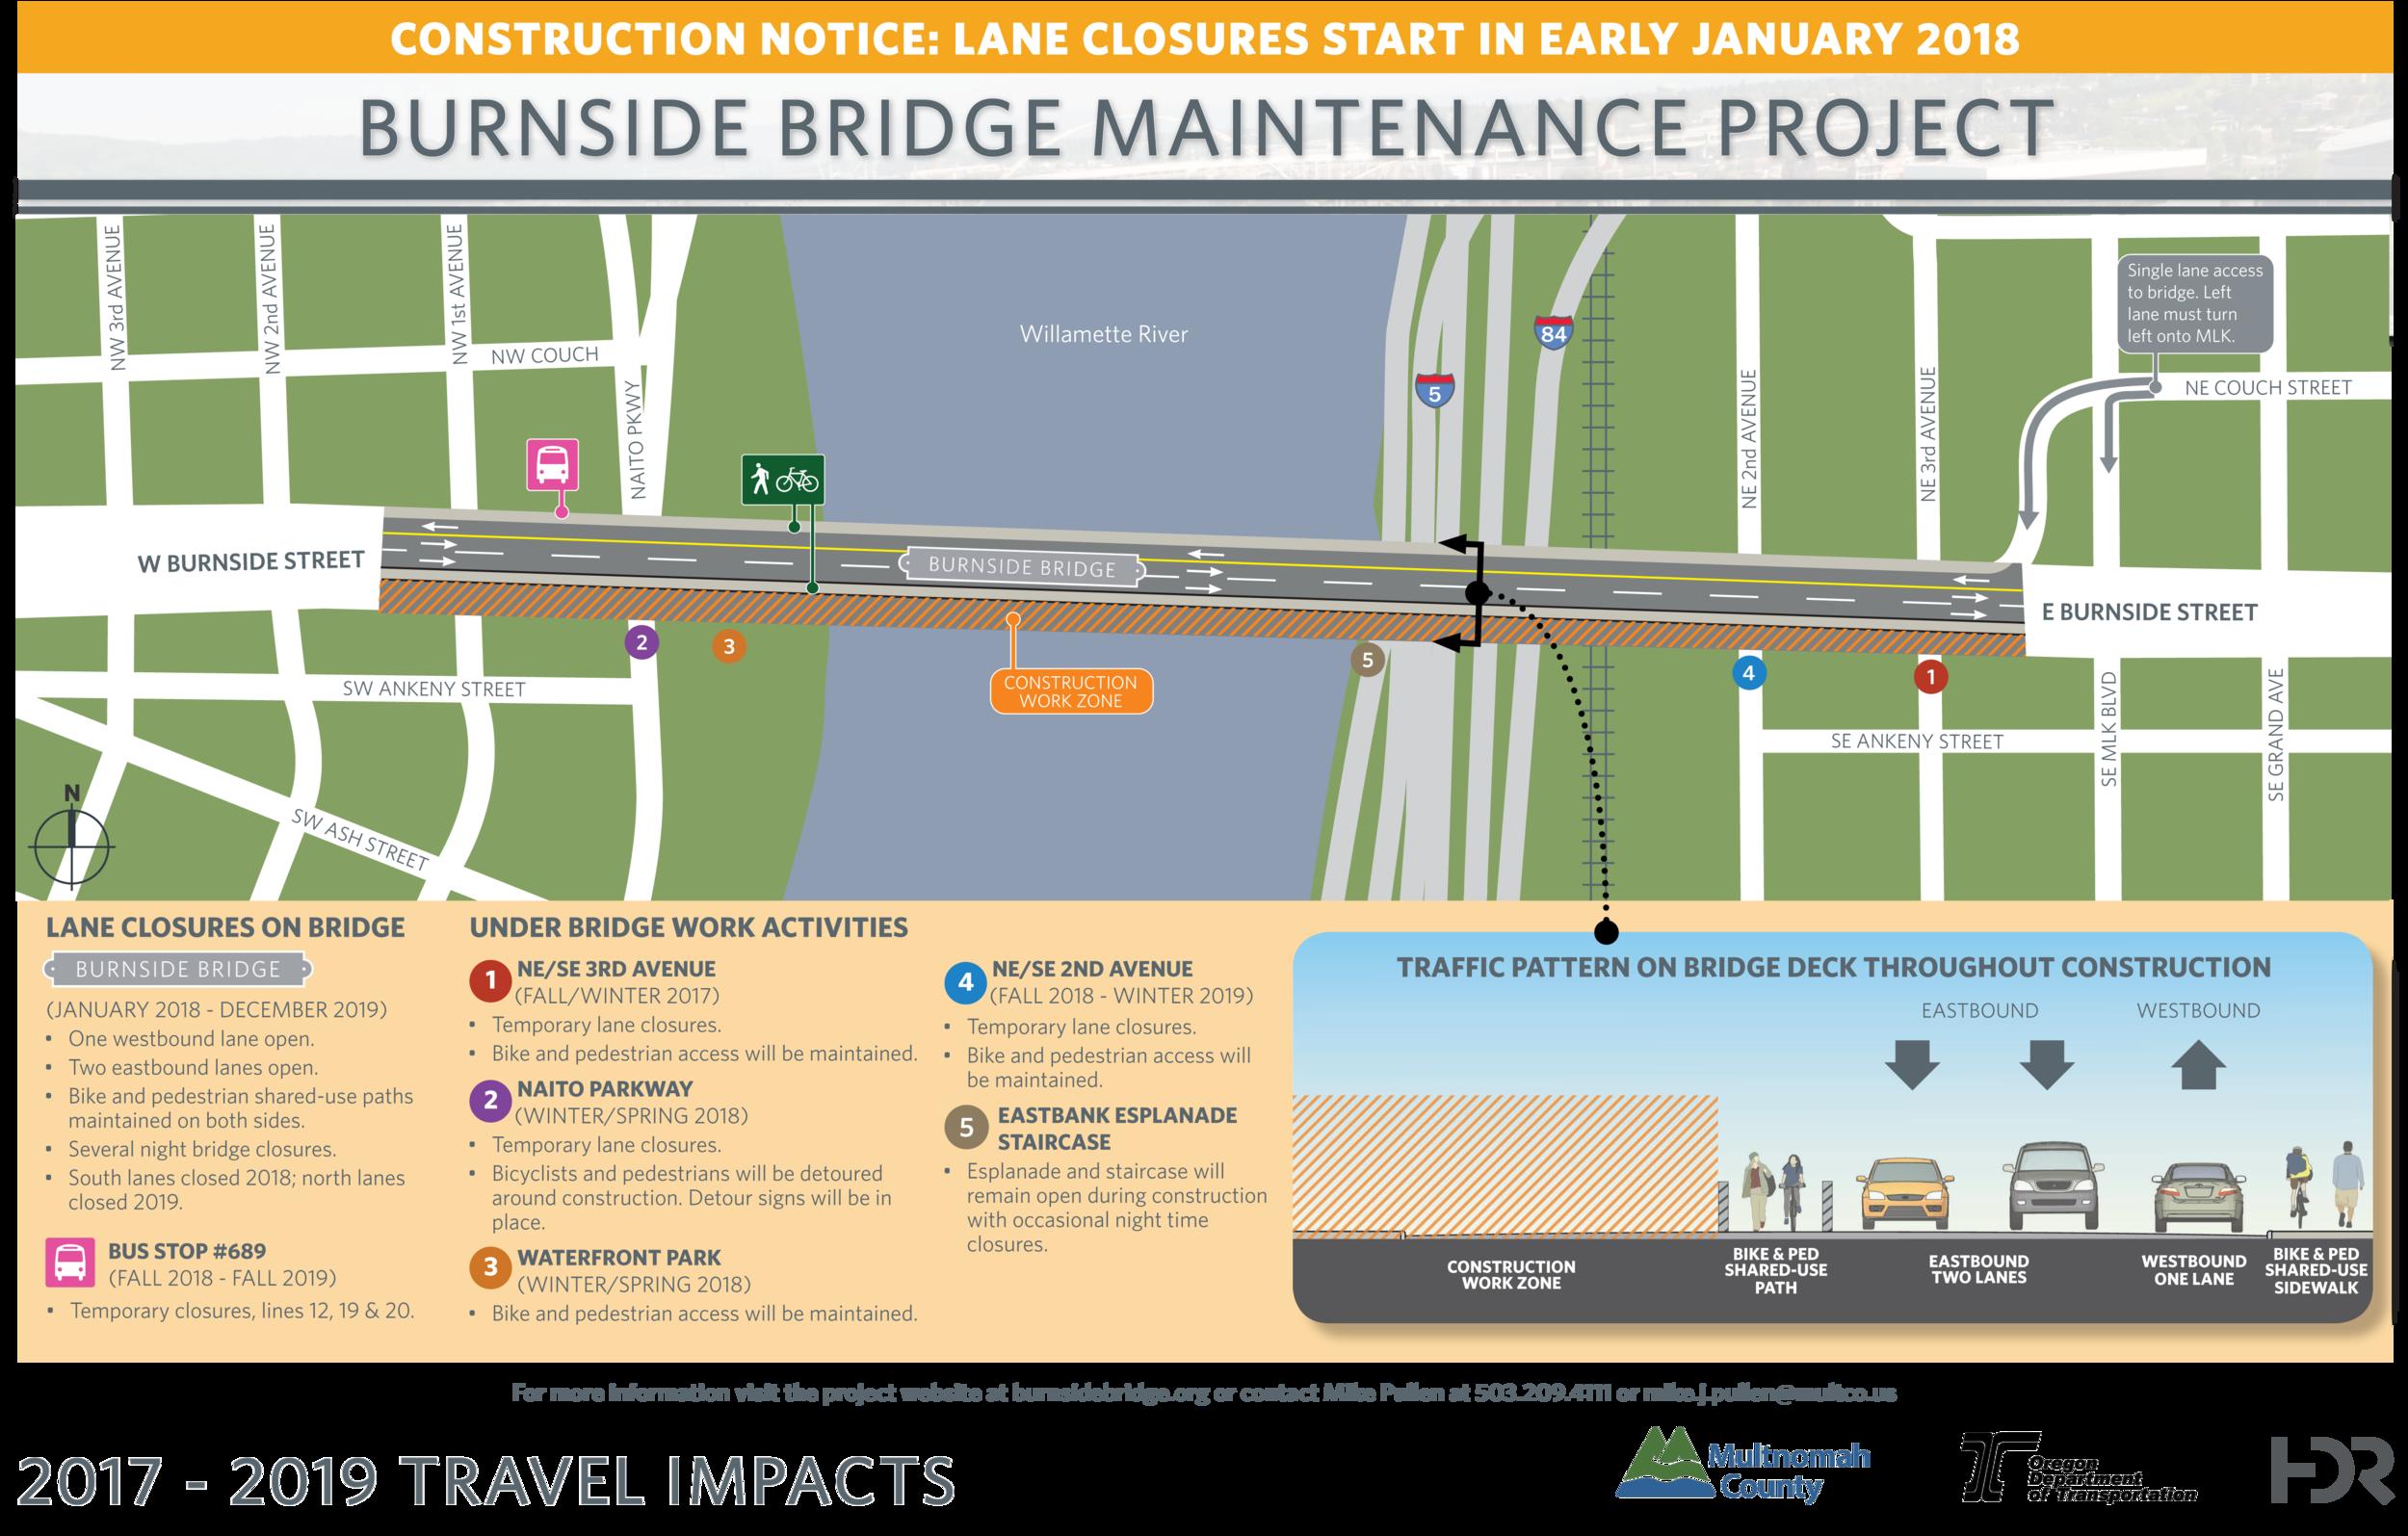 Burnside Bridge Maintenance Construction Notice 12-20-2017.png